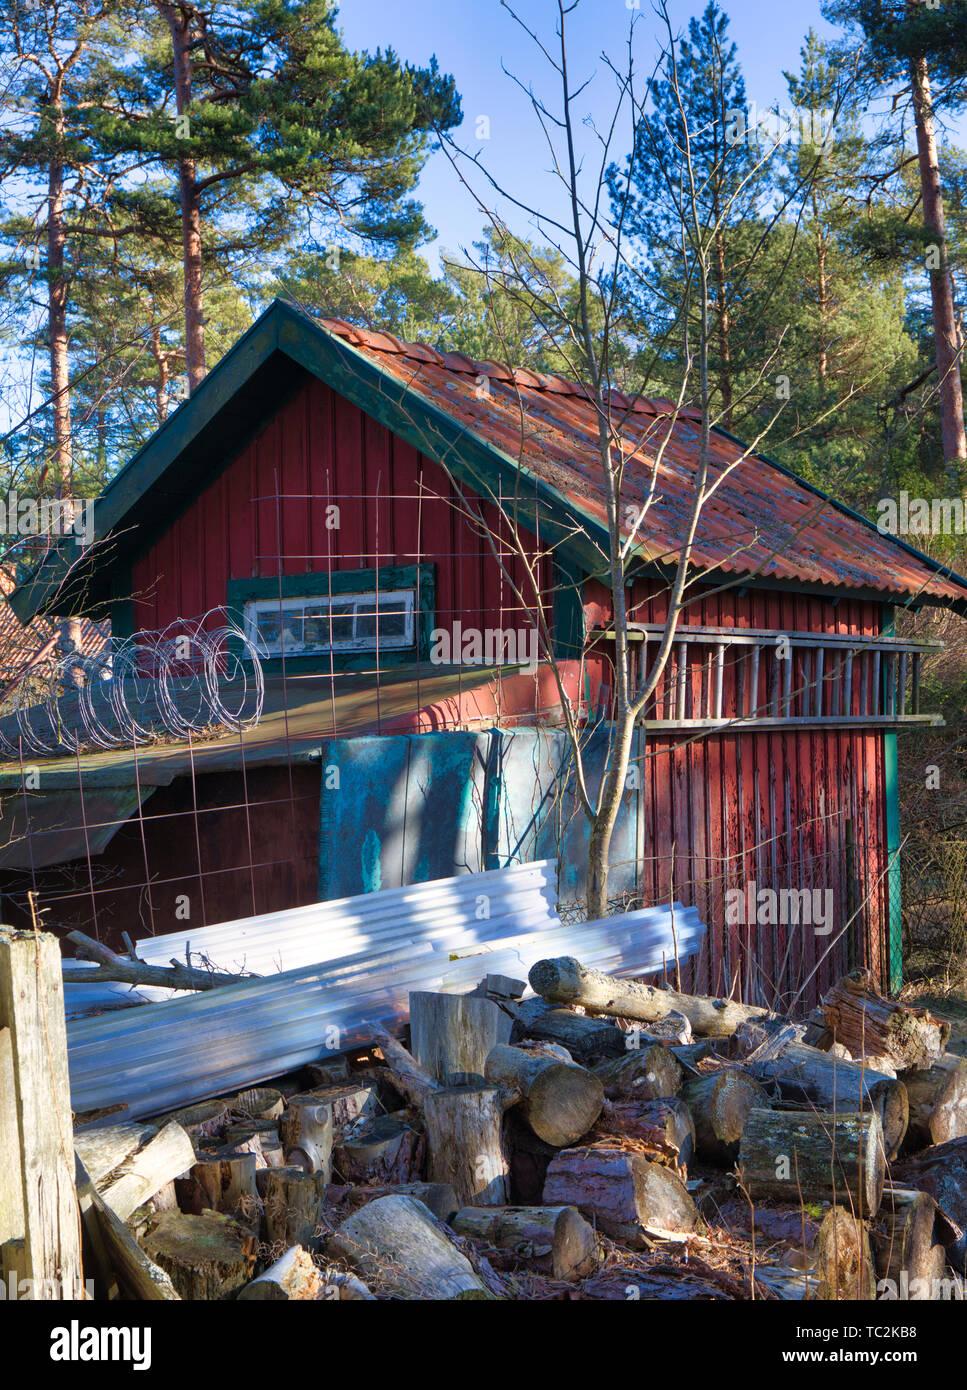 Sandhamn island, Stockholm archipelago, Sweden, Scandinavia - Stock Image